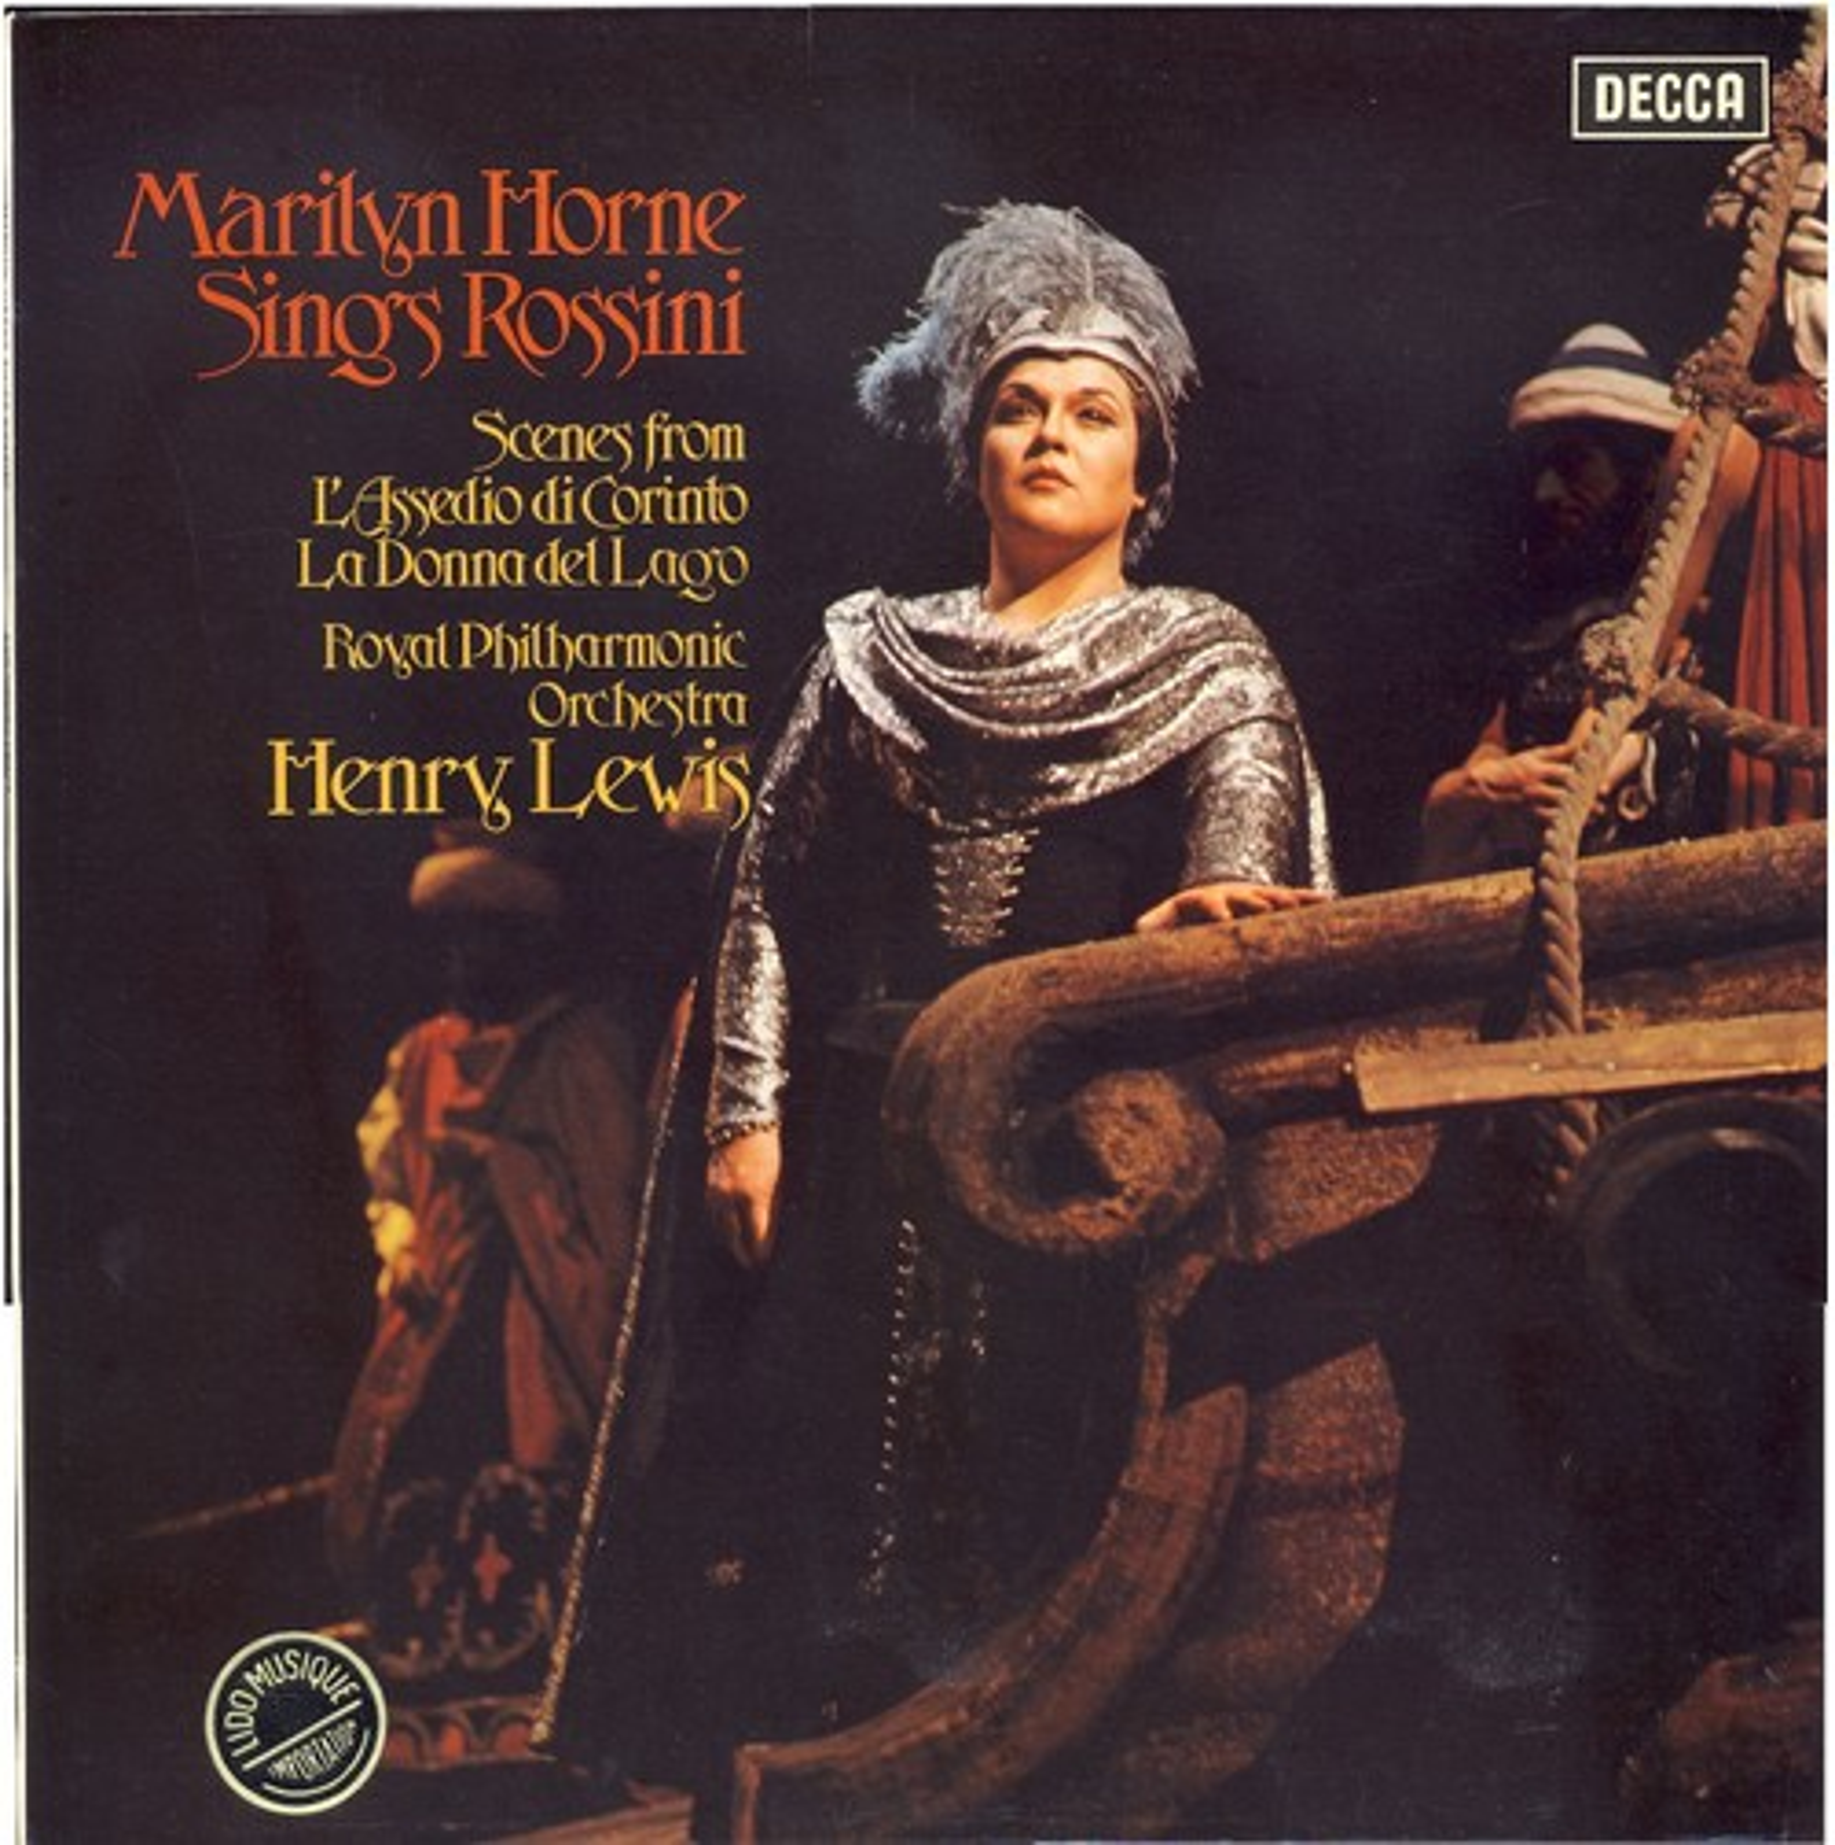 Quizz Pochettes, pour discophiles - Page 7 Marilyn-horn-sings-rossini-scenes-from-l-assedio-di-corinto-la-donna-del-lago-marilyn-hhorne-chante-rossini-le-siege-de-corinthe-la-dame-du-lac-decca-sxl-6584-marilyn-horne-henry-lewis-ambrosian-opera-chorus-royal-philharmonic-orchestra-996277036_L